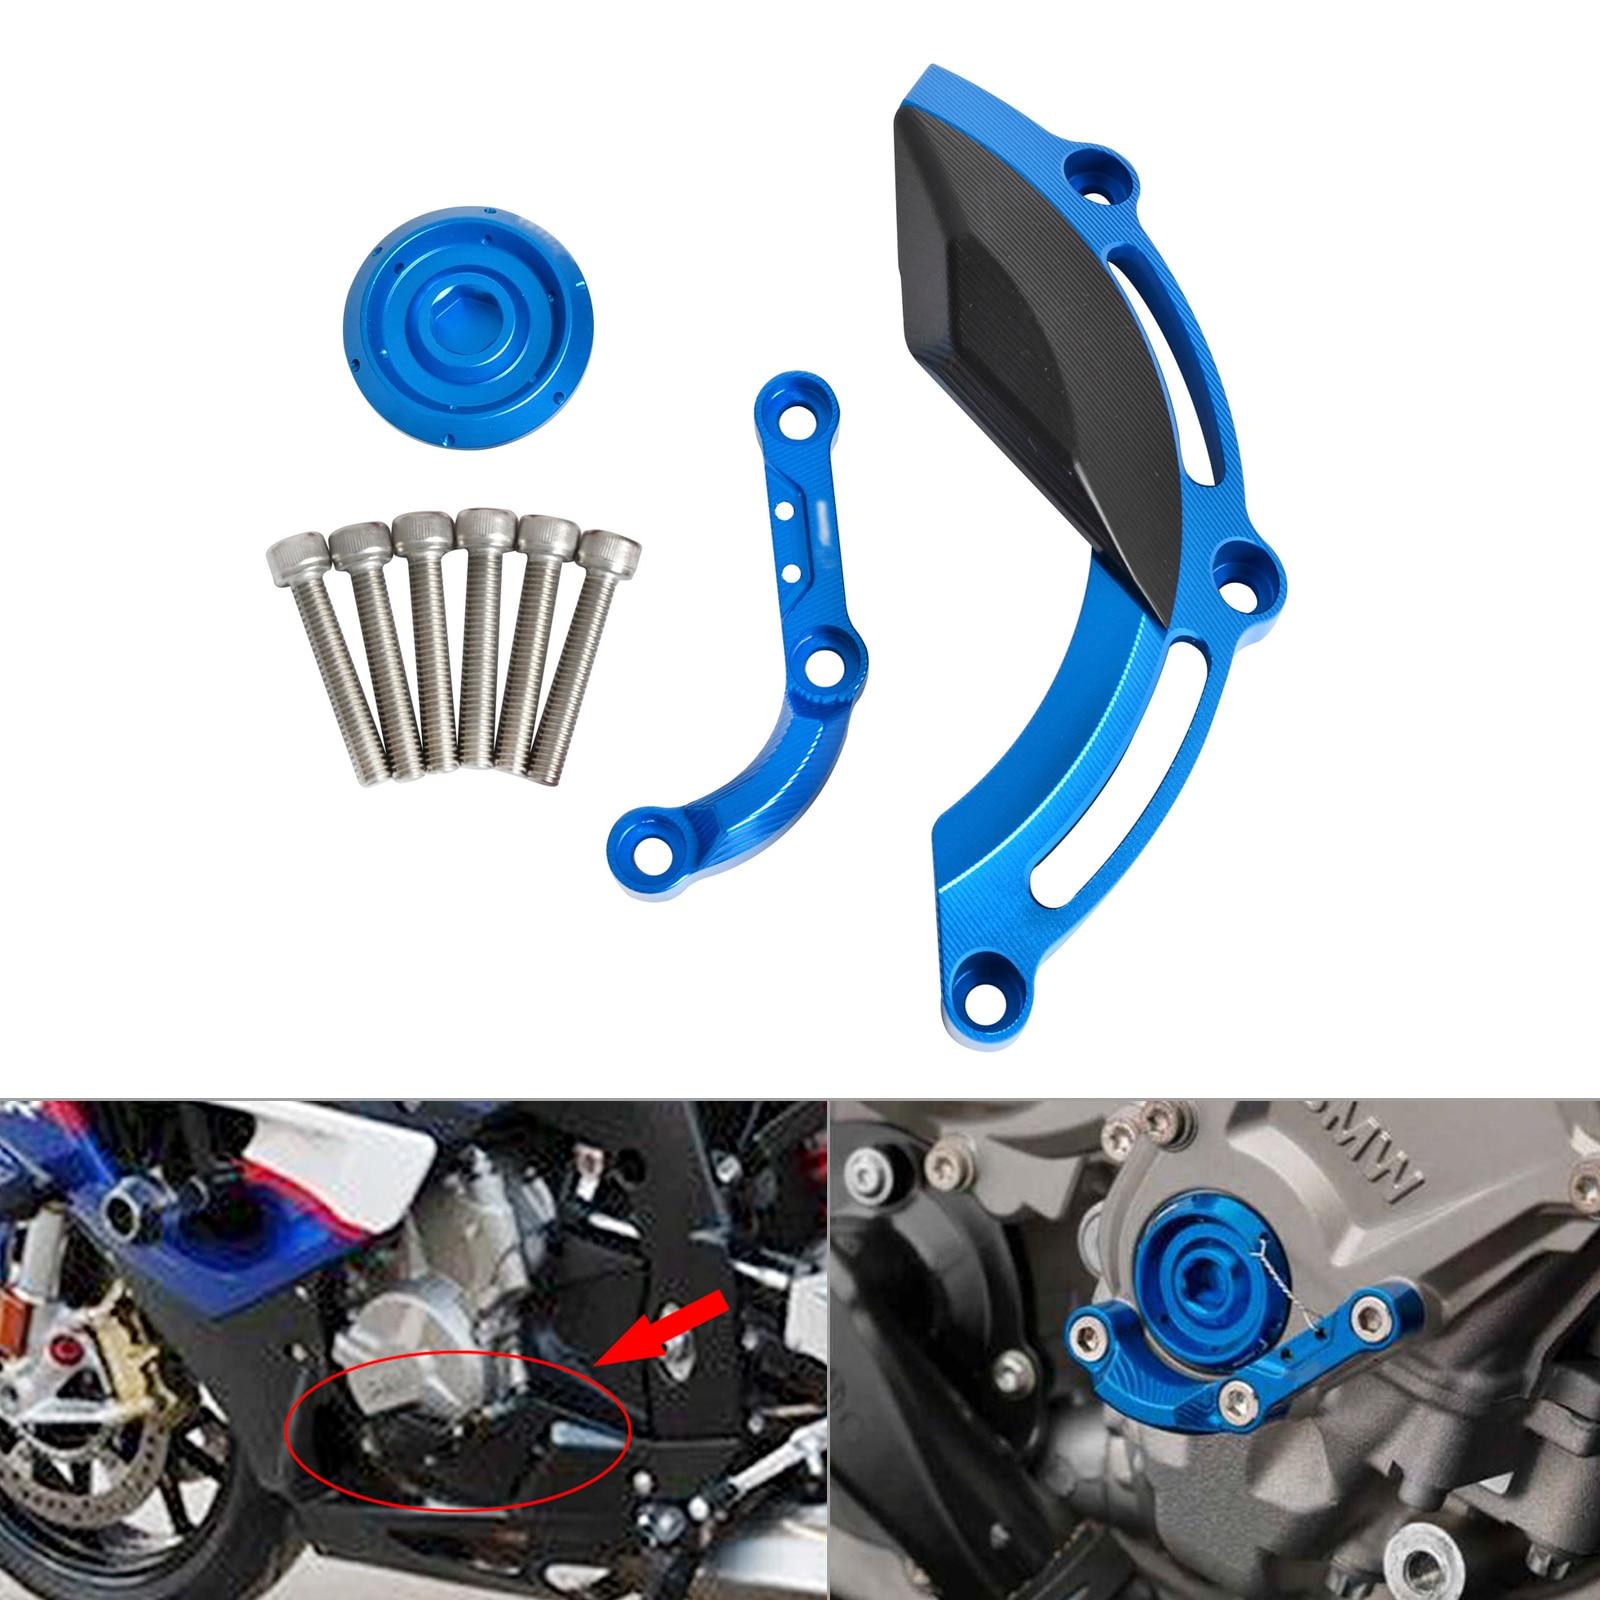 Motor de la motocicleta deslizante cubierta choque Protector para BMW S1000R 14-19 S1000RR 09-18 S1000XR 15-17 HP4 2012-2014 S 1000 RR XR